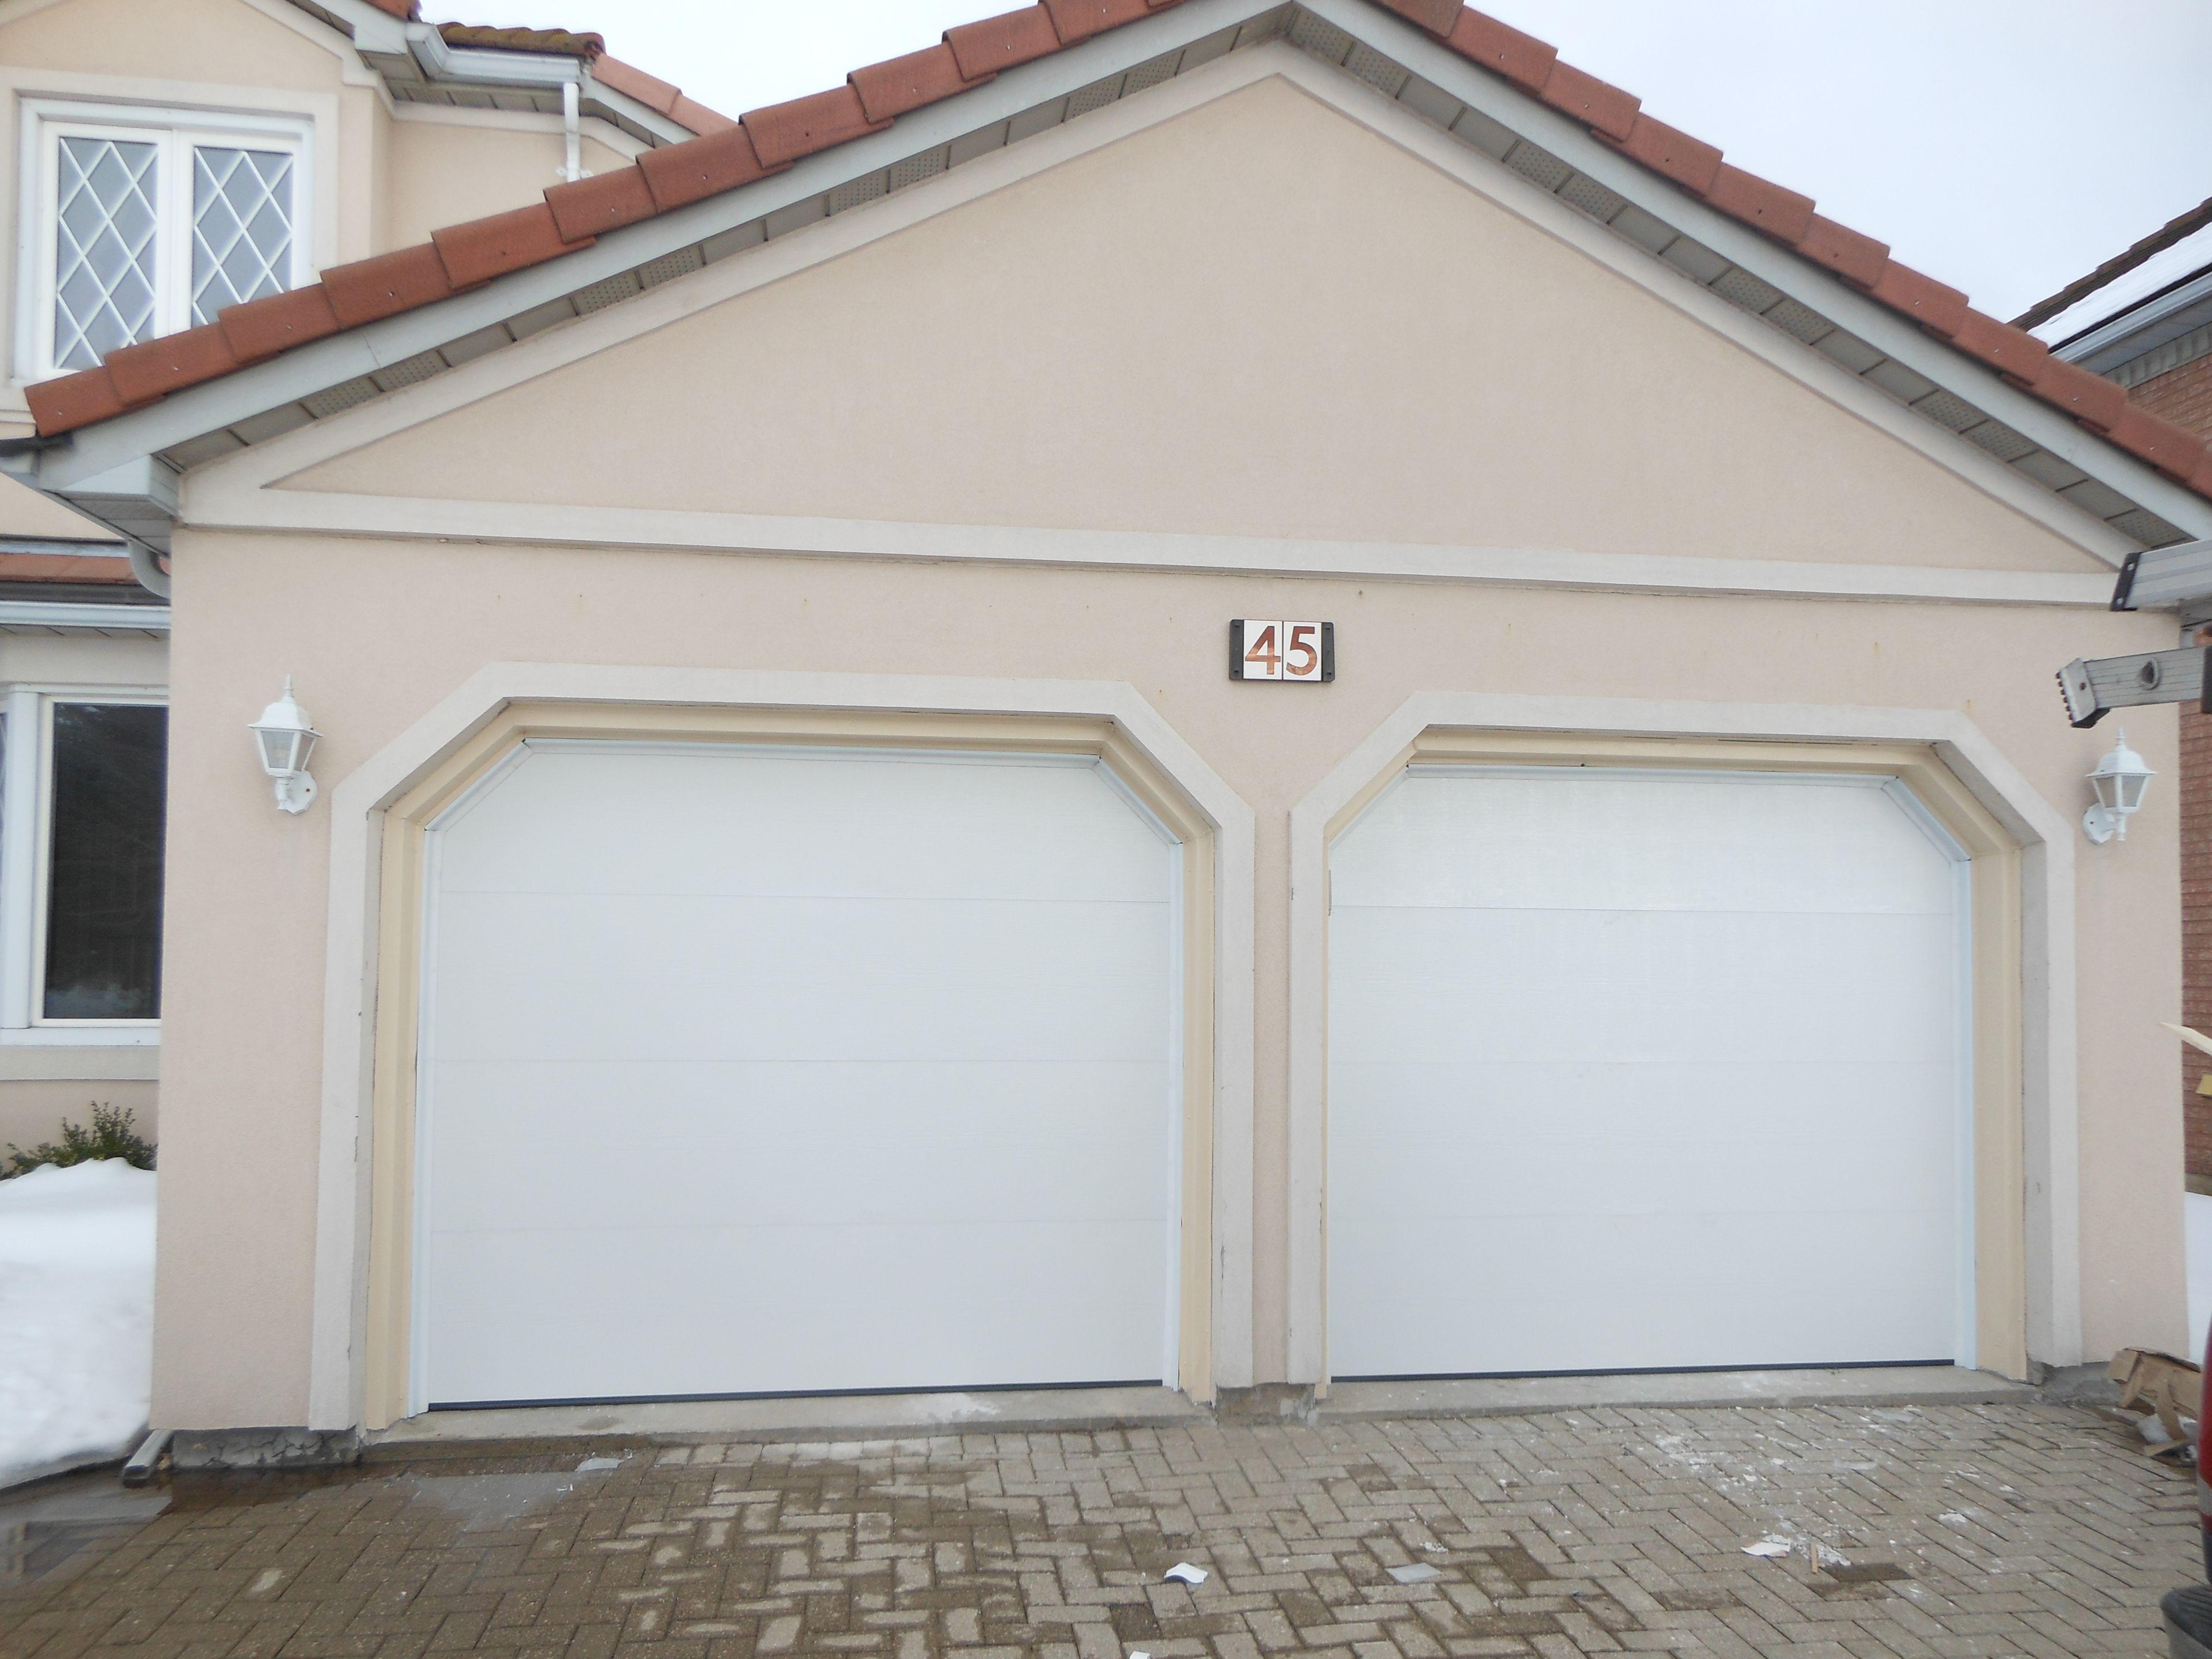 Flush Panel Garage Door | Flush Panel Doors | Pinterest | Garage doors and Doors & Flush Panel Garage Door | Flush Panel Doors | Pinterest | Garage ... Pezcame.Com